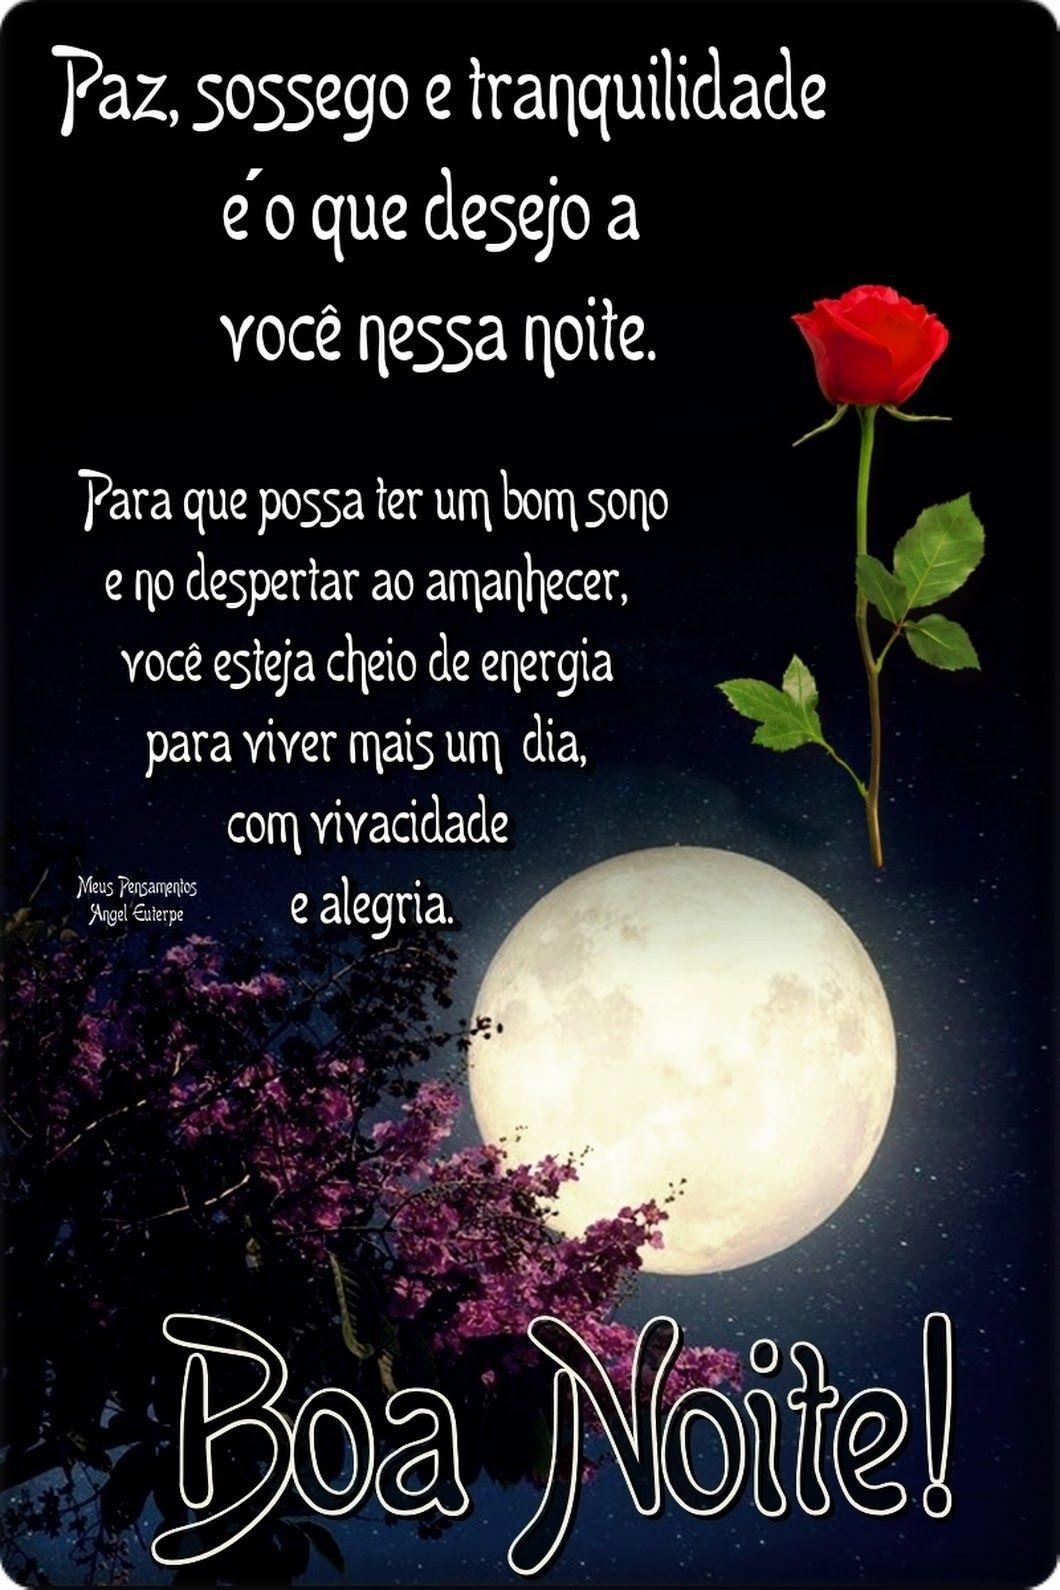 Pin De Lourice Azambuja Em Boa Noite Boa Noite Especial